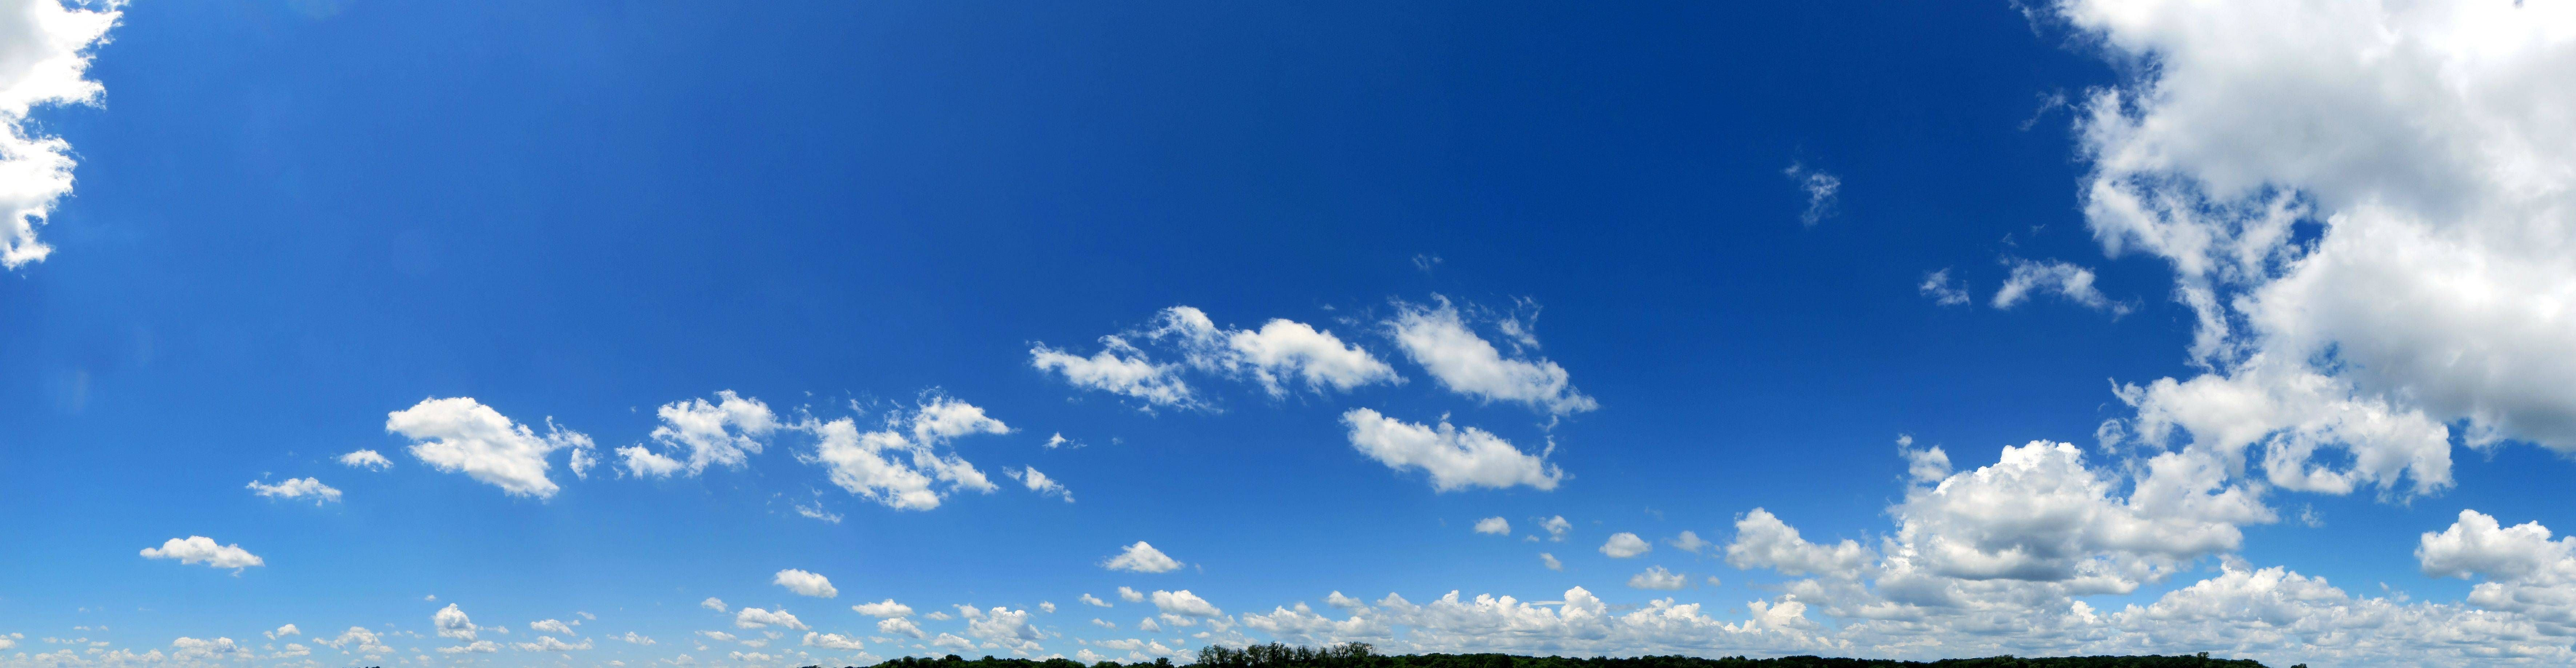 My favorite Sky Texture | textures | Pinterest